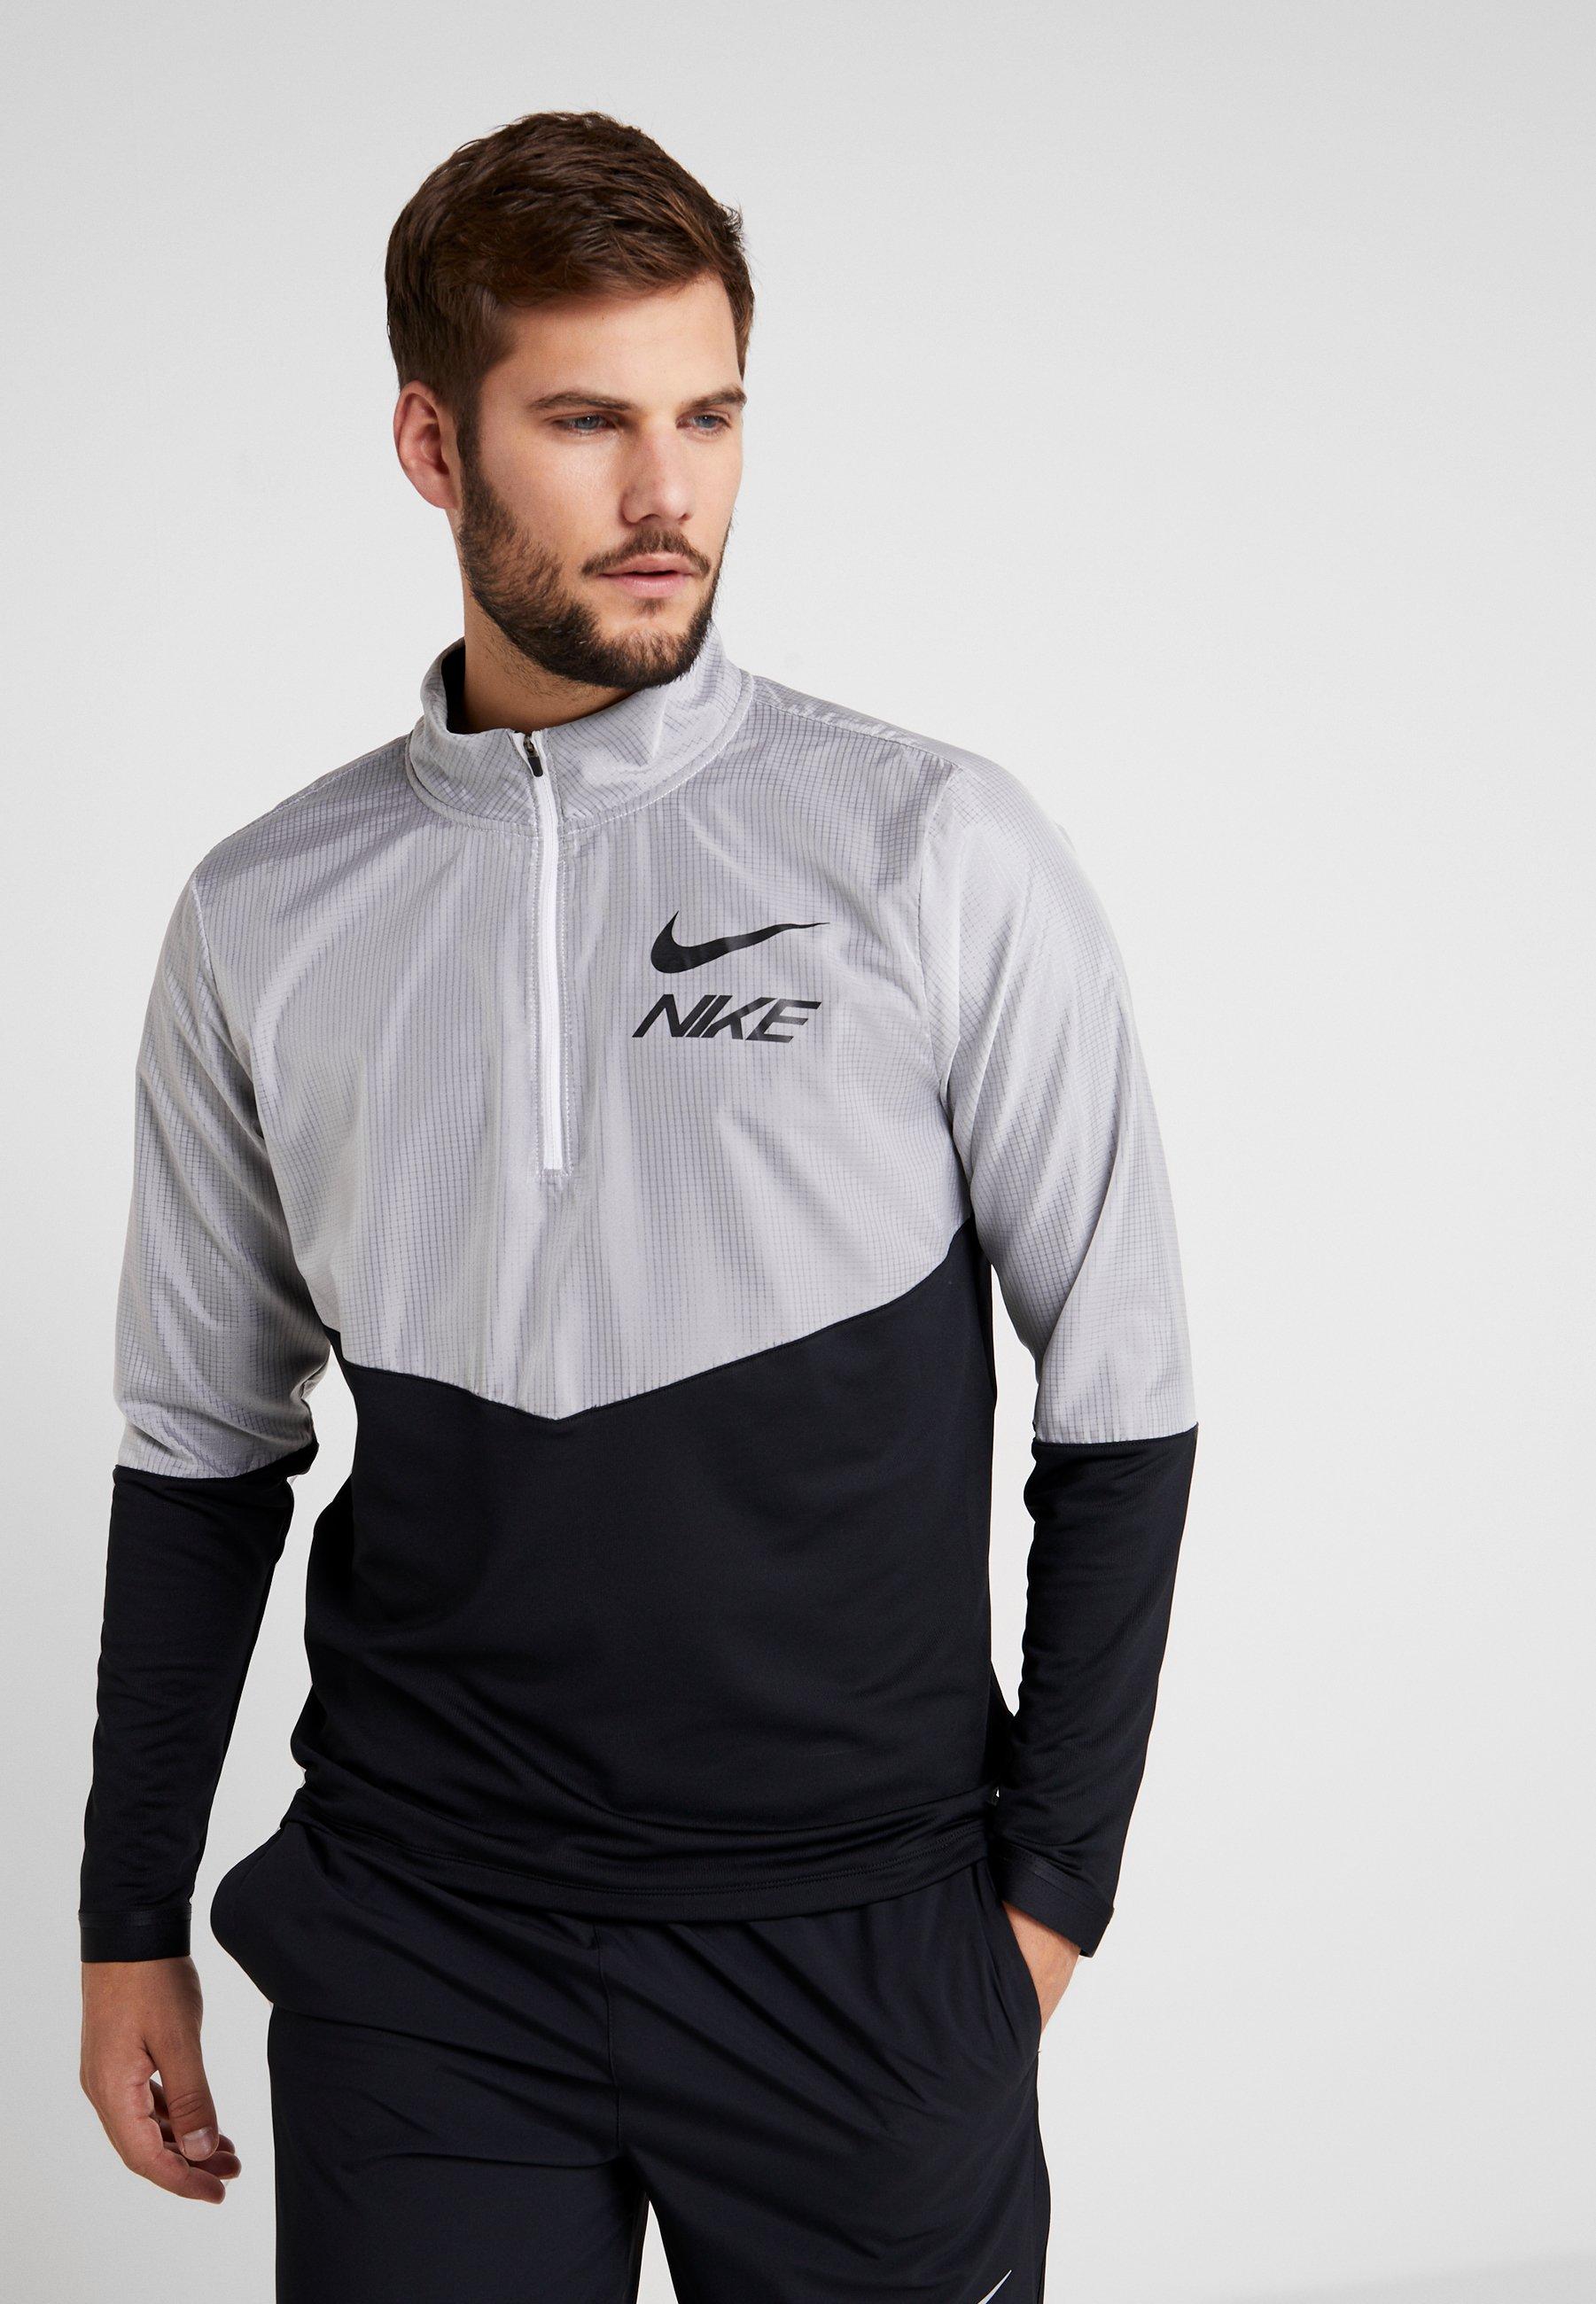 reflective Black Performance Top HybridSweatshirt Nike Silver u1cTFJlK3